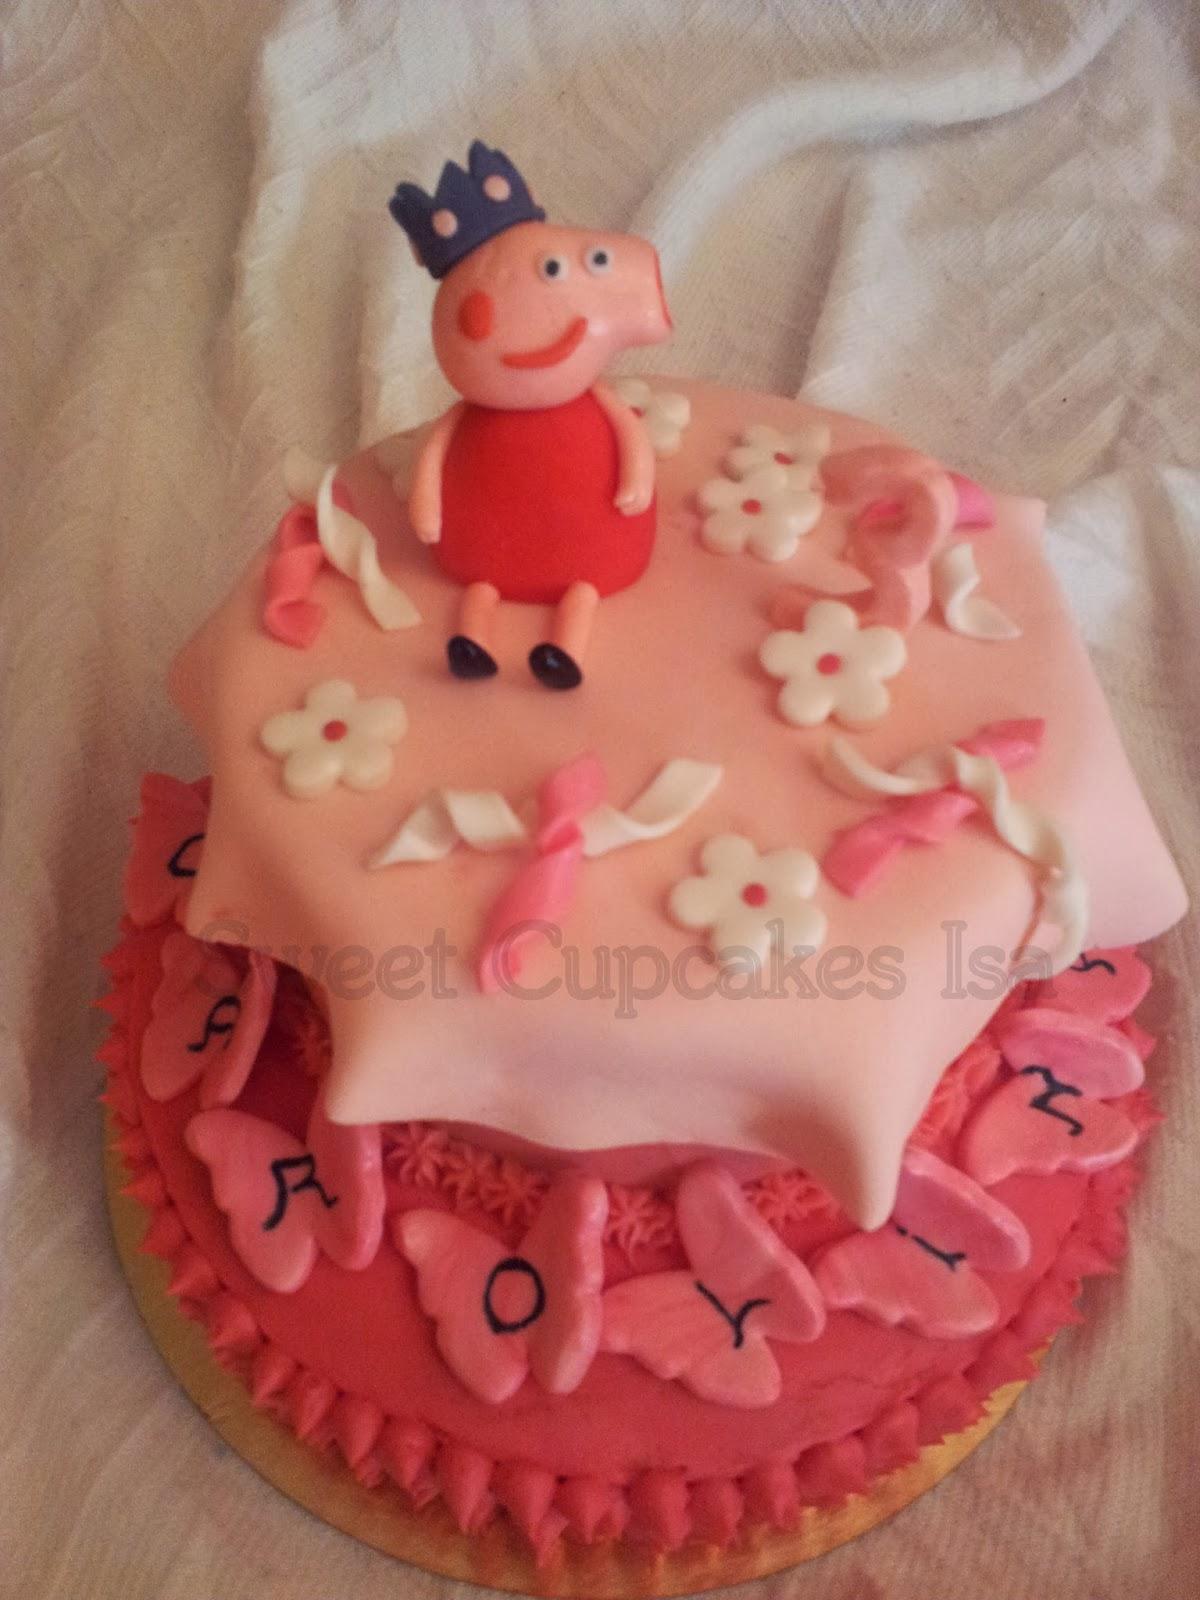 sweet cupcakes isa